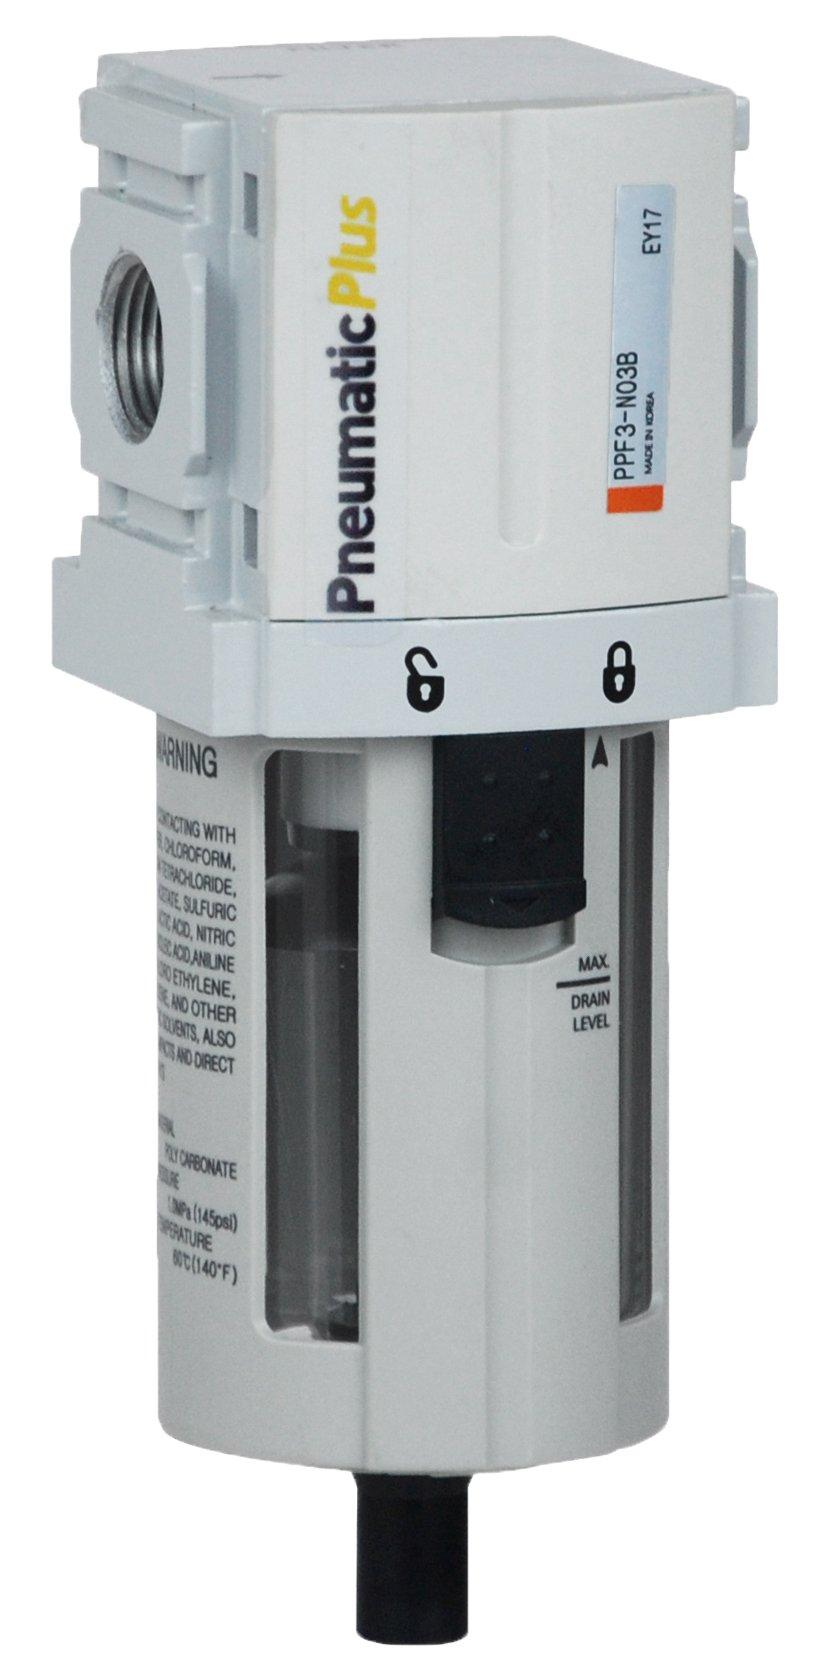 PneumaticPlus PPF3-N02B Compressed Air Particulate Filter, 1/4'' NPT (High Flow), 5 Micron, Poly Bowl, Manual Drain, Bracket